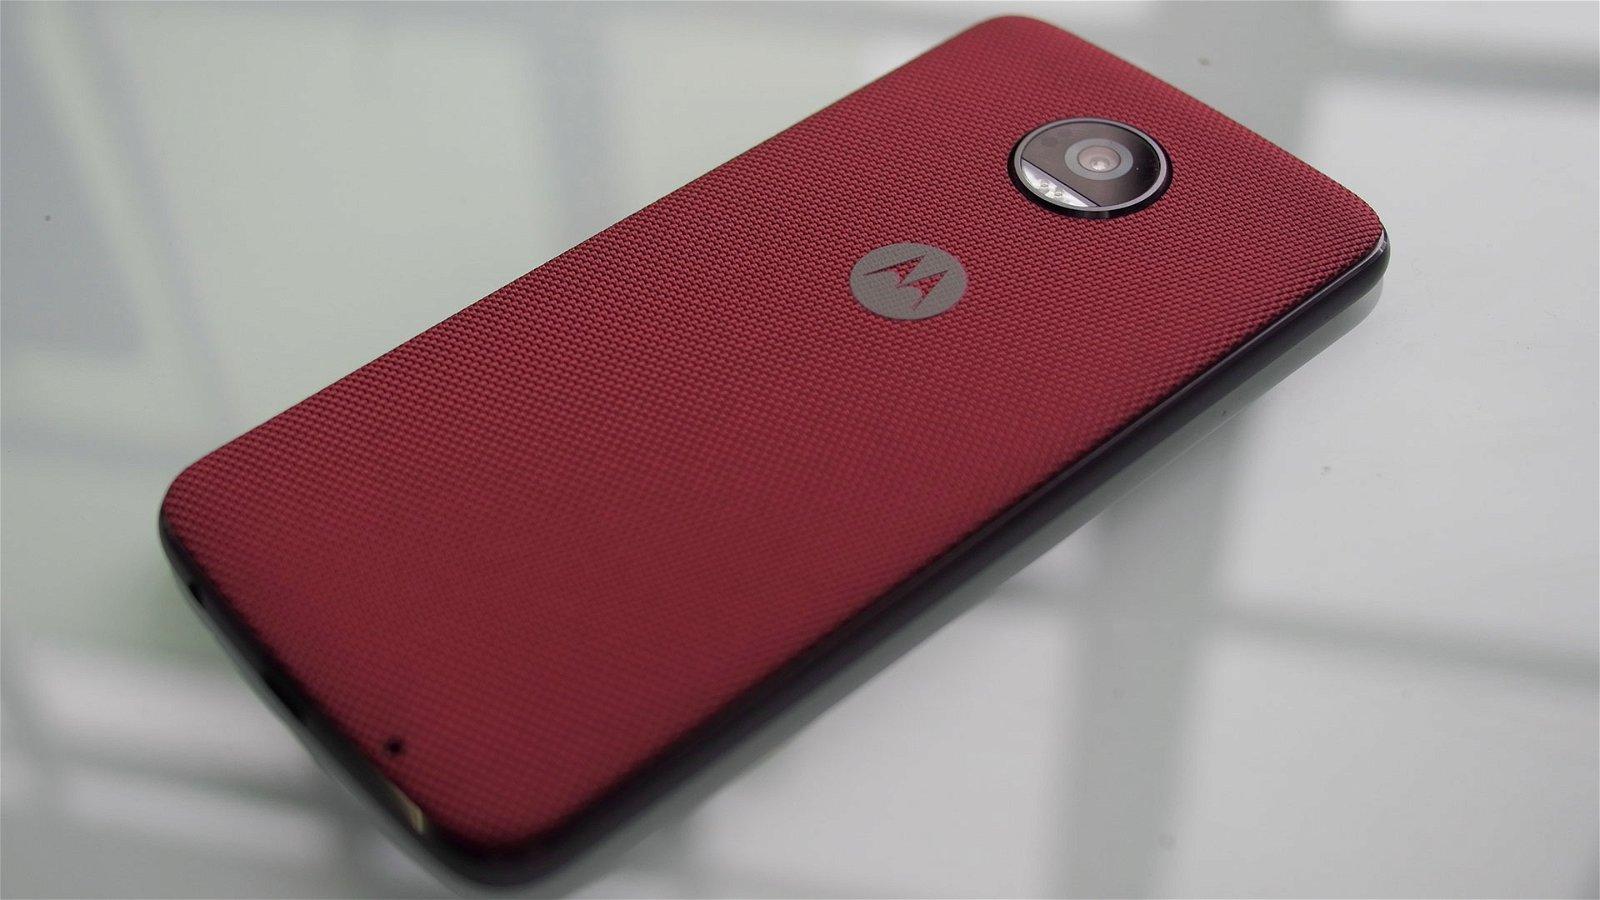 Motorola Moto Z2 Play (Smartphone) Review 2